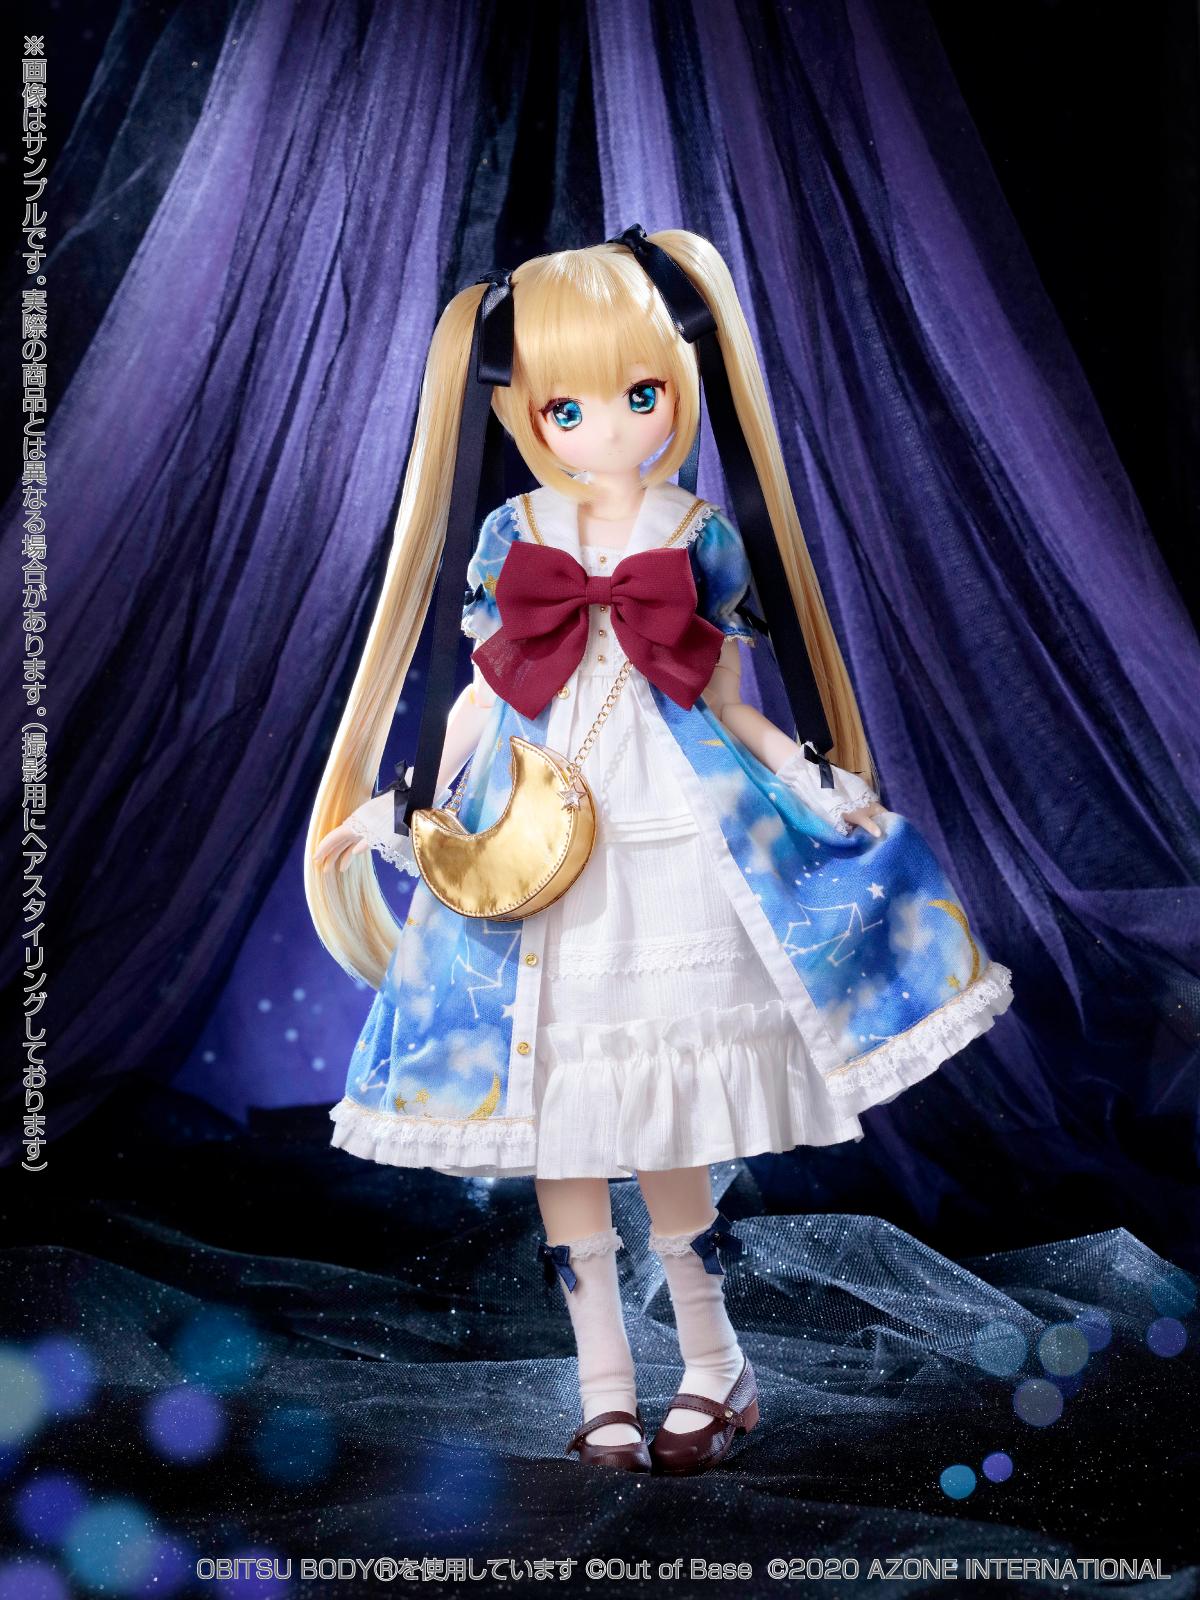 Iris Collect petit『あんな/Stellar light twins(通常販売ver.)』1/3 完成品ドール-001